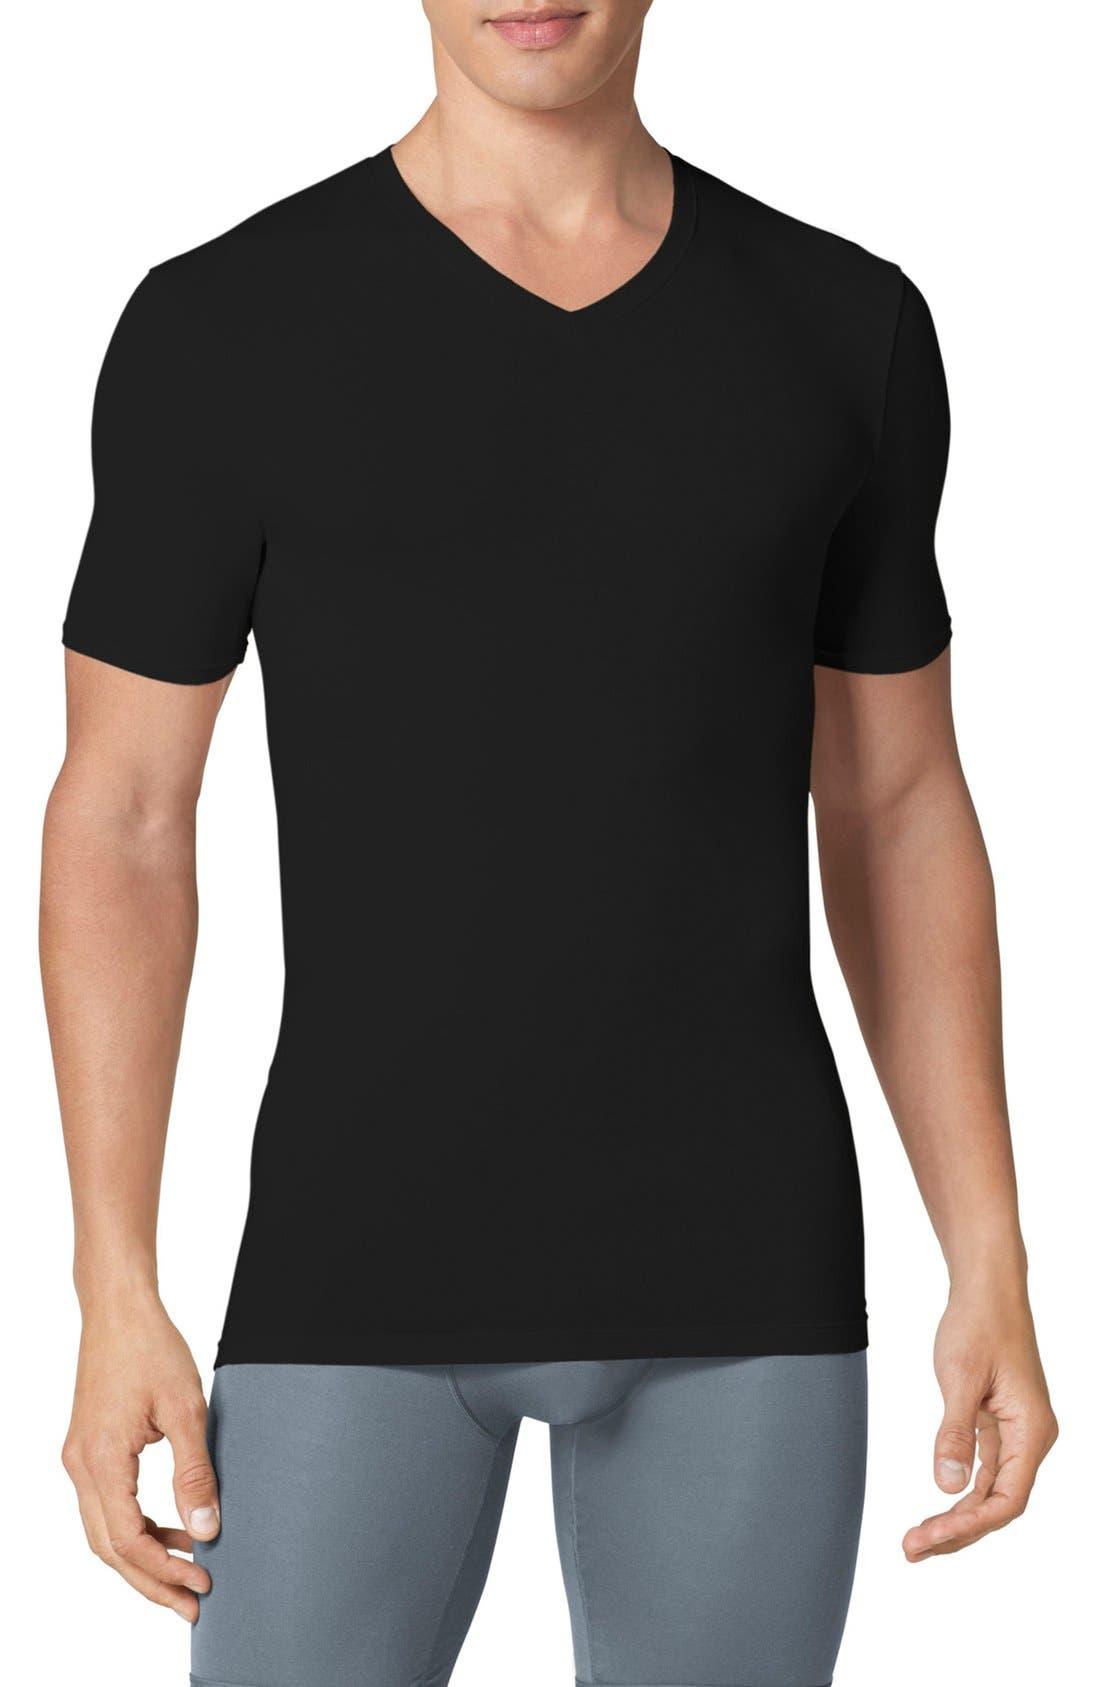 Tommy John 'Second Skin' High V-Neck Undershirt